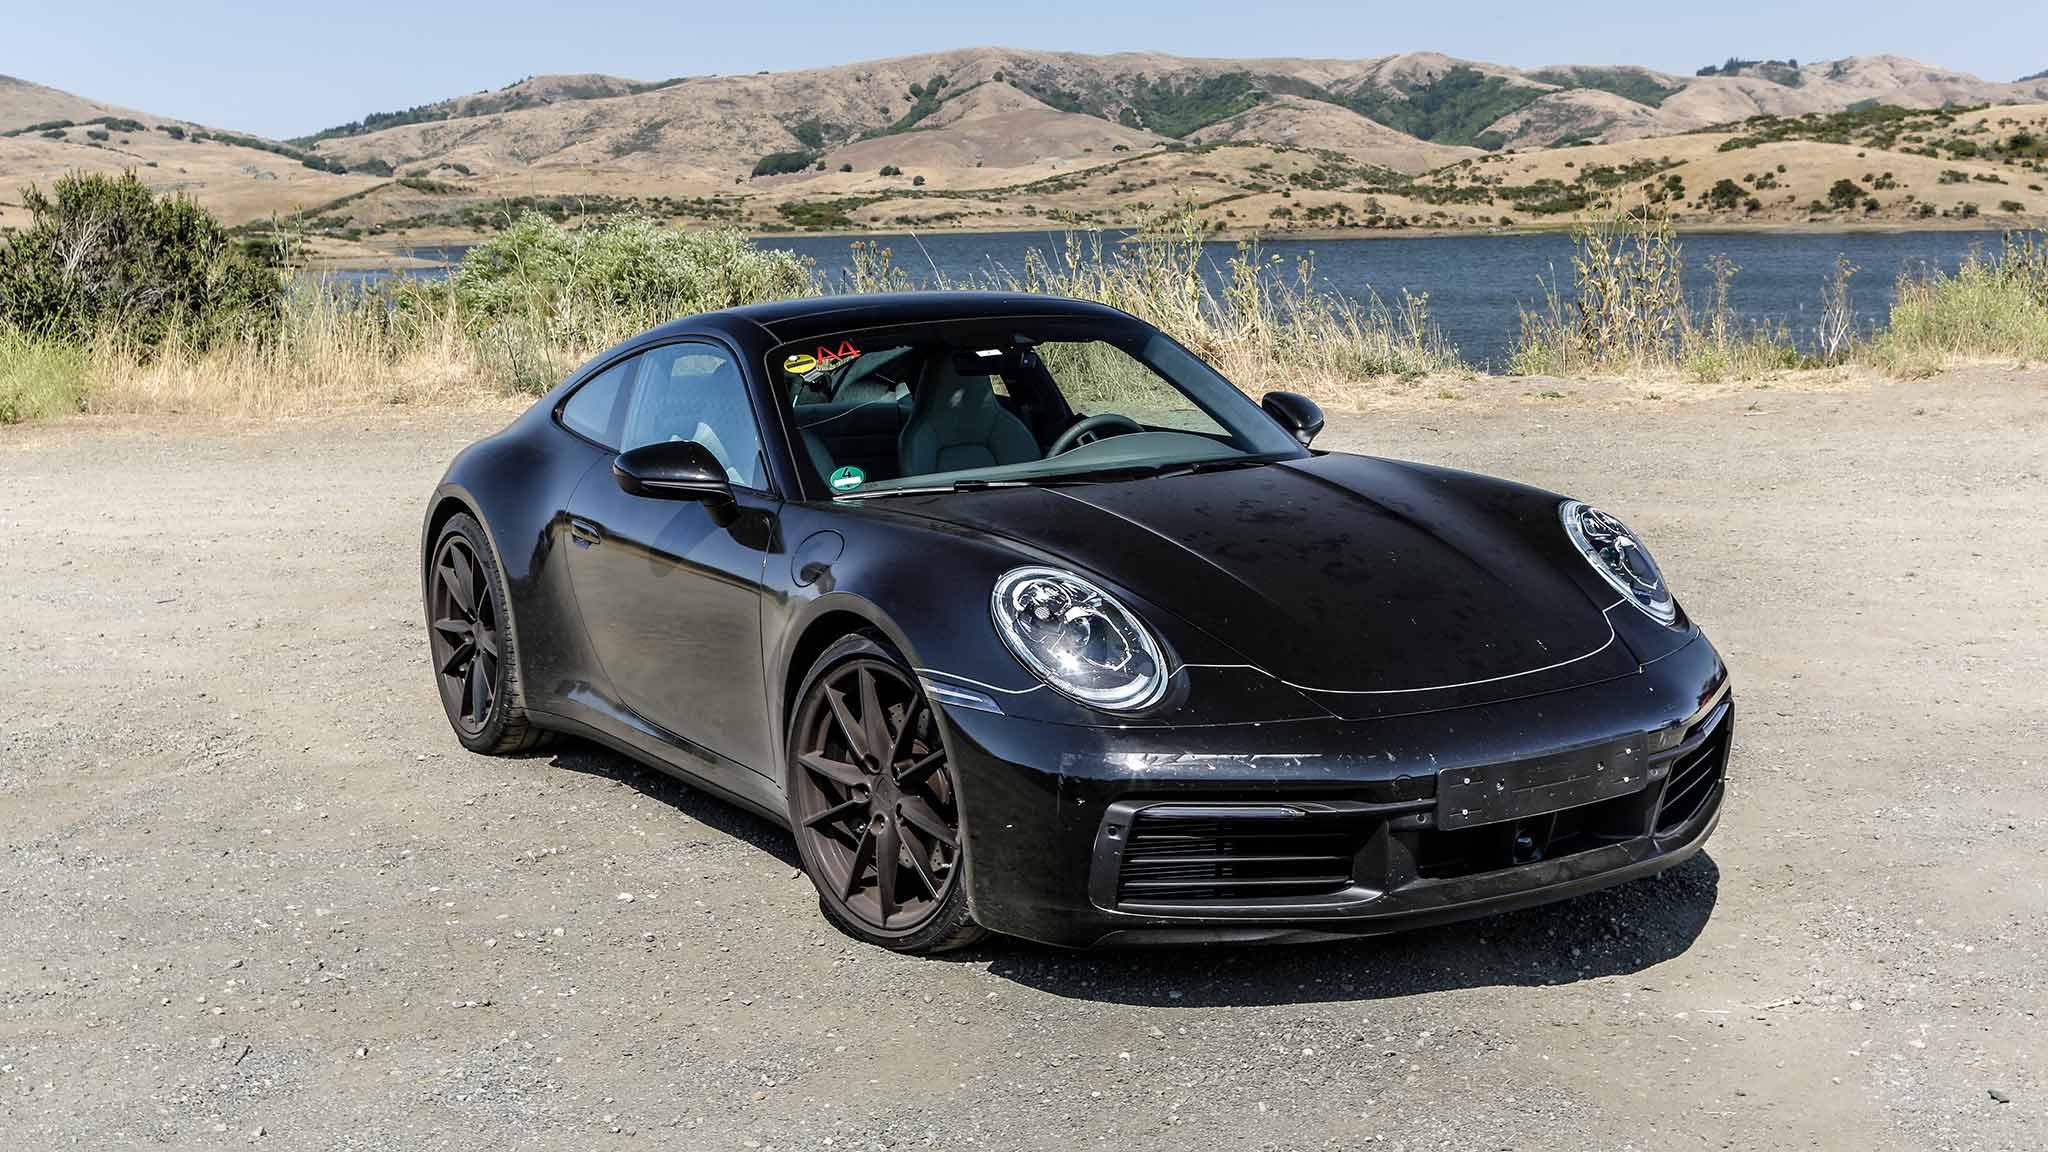 33 Best Review 2020 Porsche 992 Research New with 2020 Porsche 992